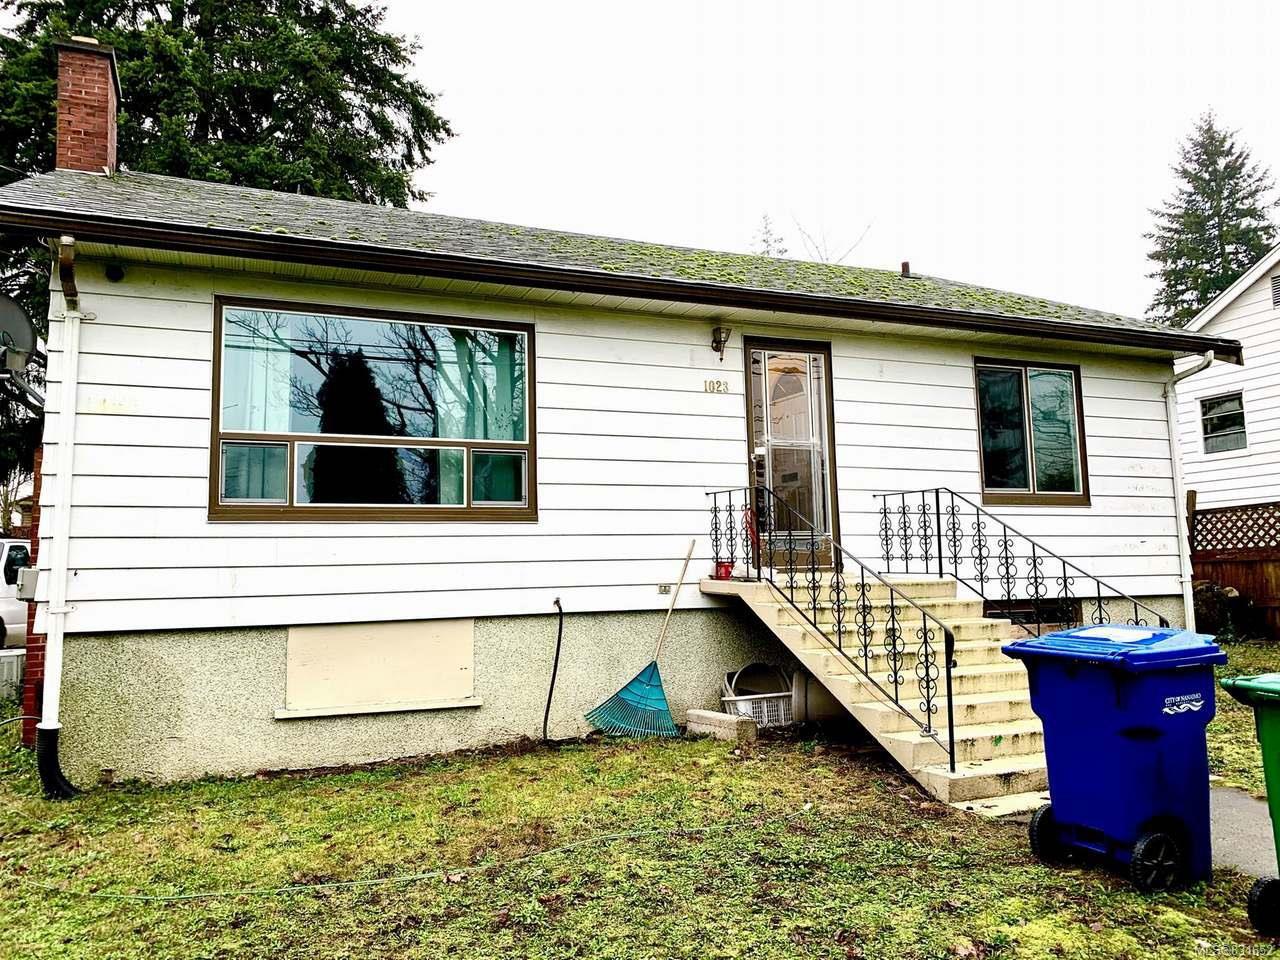 Main Photo: 1023 Dufferin Cres in NANAIMO: Na Central Nanaimo House for sale (Nanaimo)  : MLS®# 831652